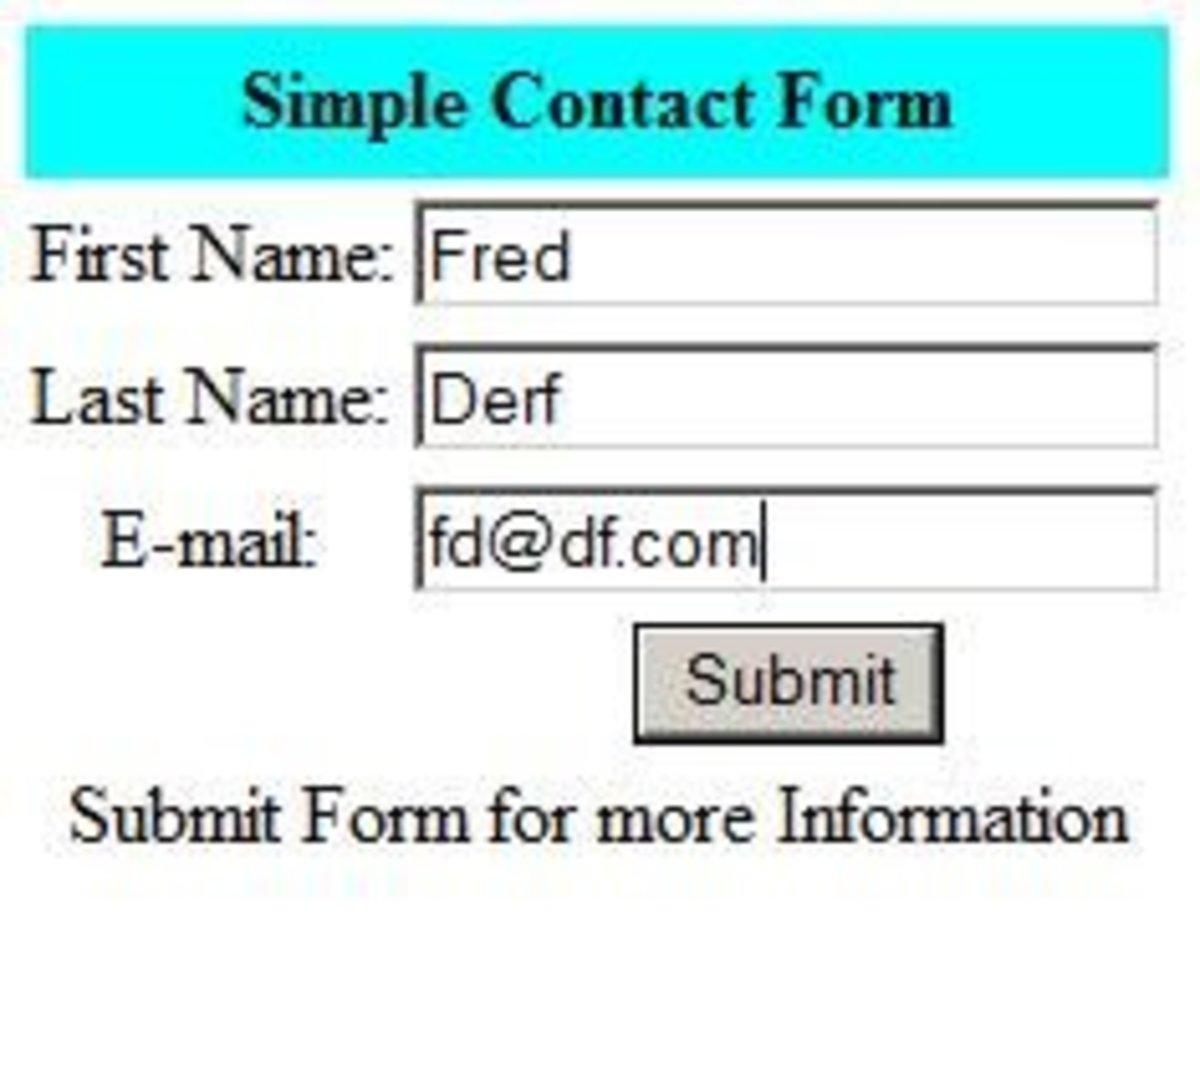 retrieving-html-form-data-using-javascritp